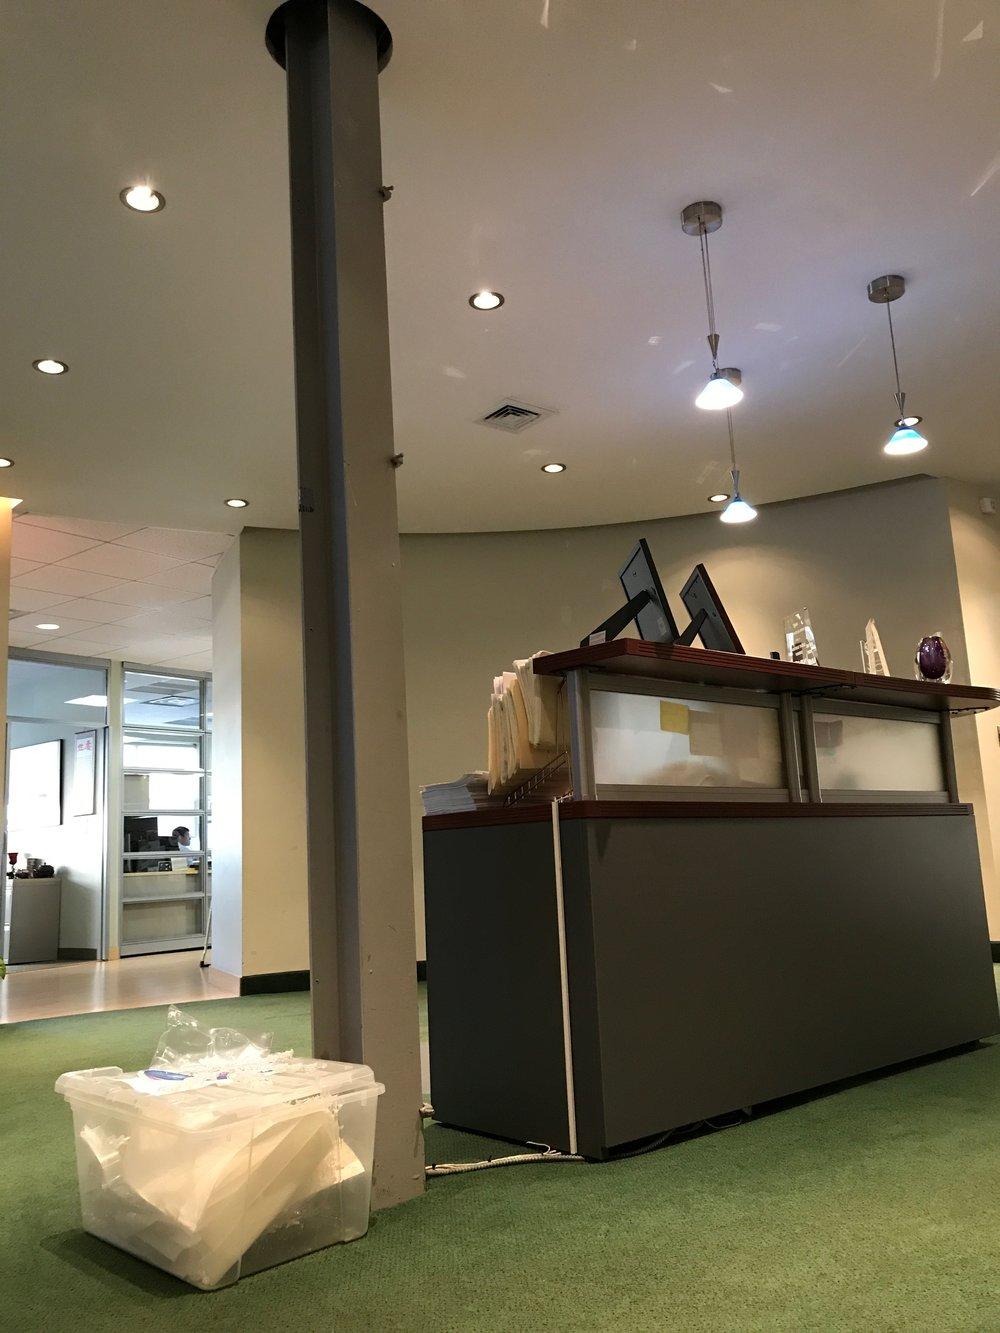 transformation-before-after-hadar-interiors-interior-design-hotel-reception